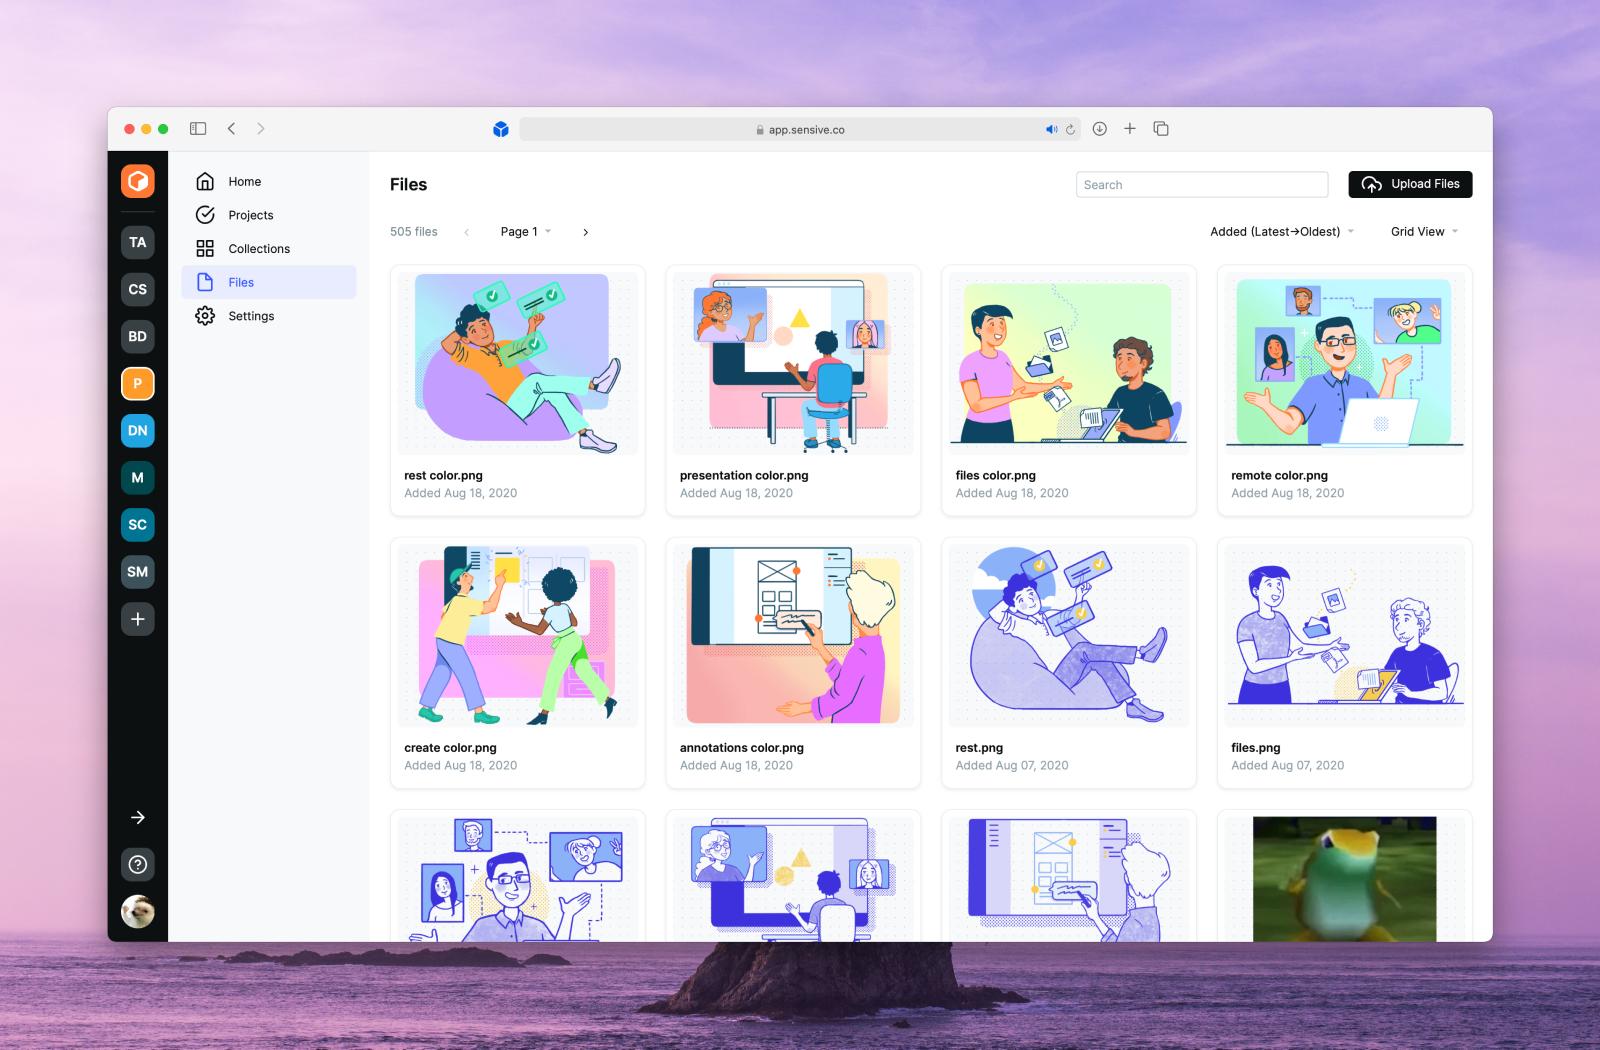 Screenshot of the modern Sensive UI